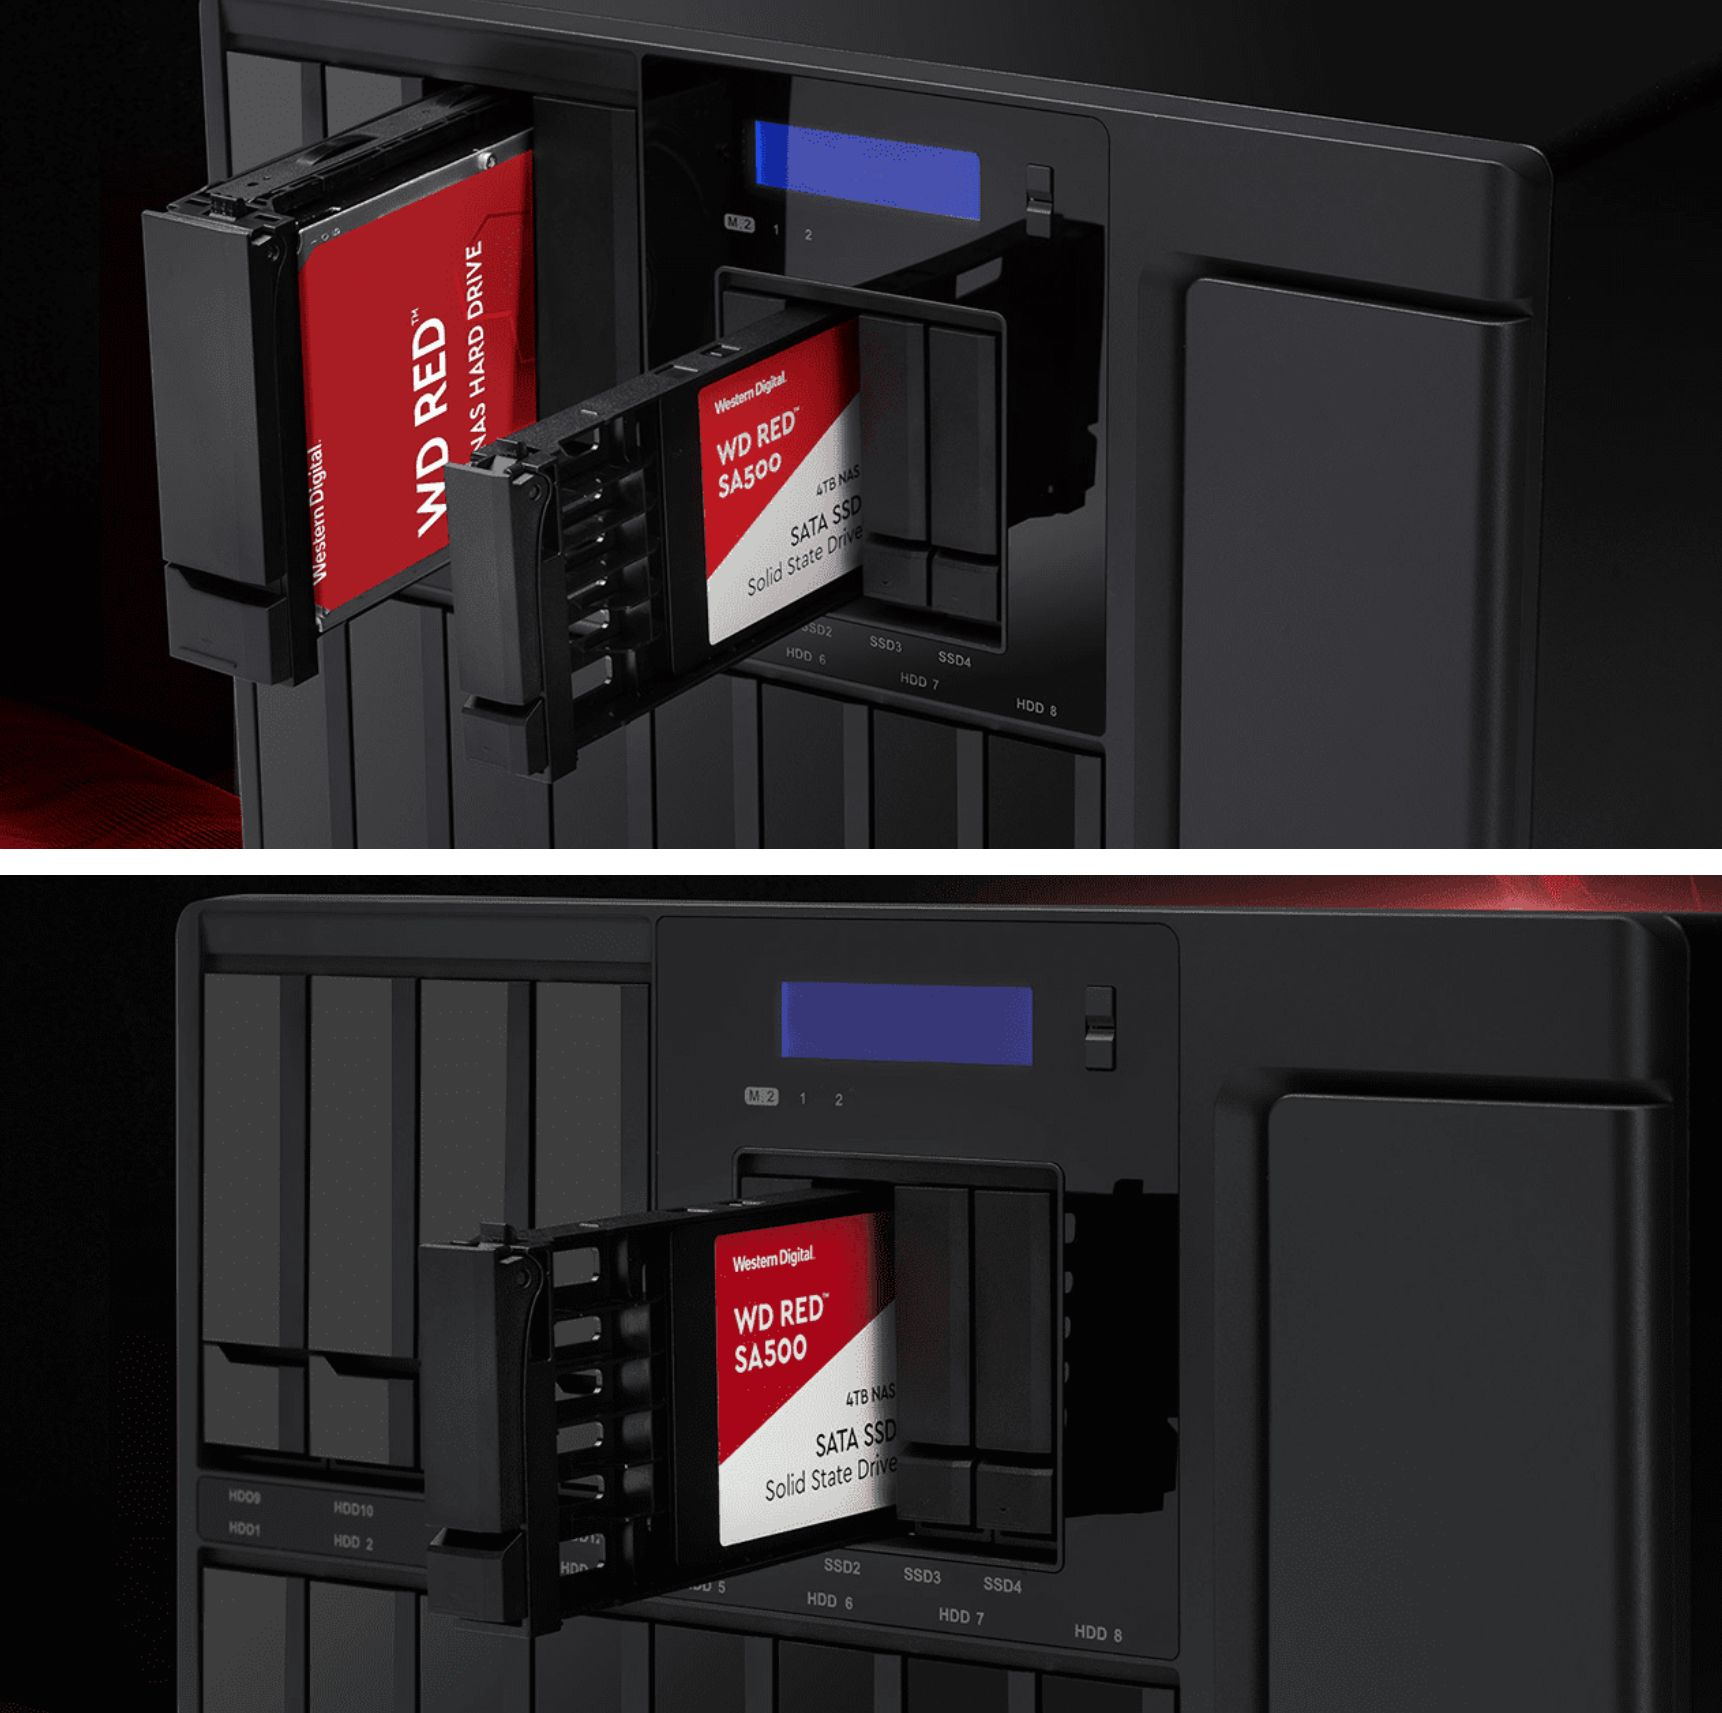 #1466 - 'WD Red™ SA500 NAS SATA SSD' - shop_westerndigital_com.jpg